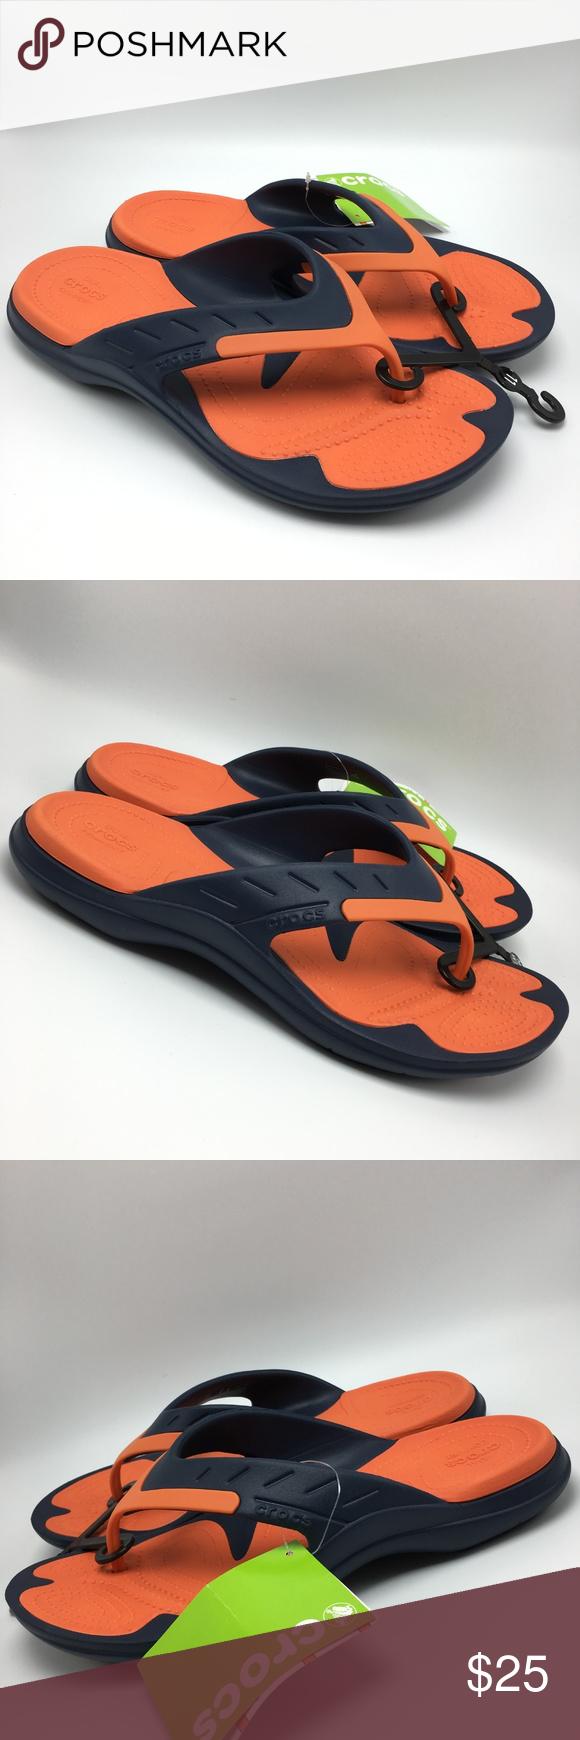 fcad73458a58 Crocs Modi Sport Flip Sandals Unisex 202636-4V9 Brand new pair of Crocs  unisex